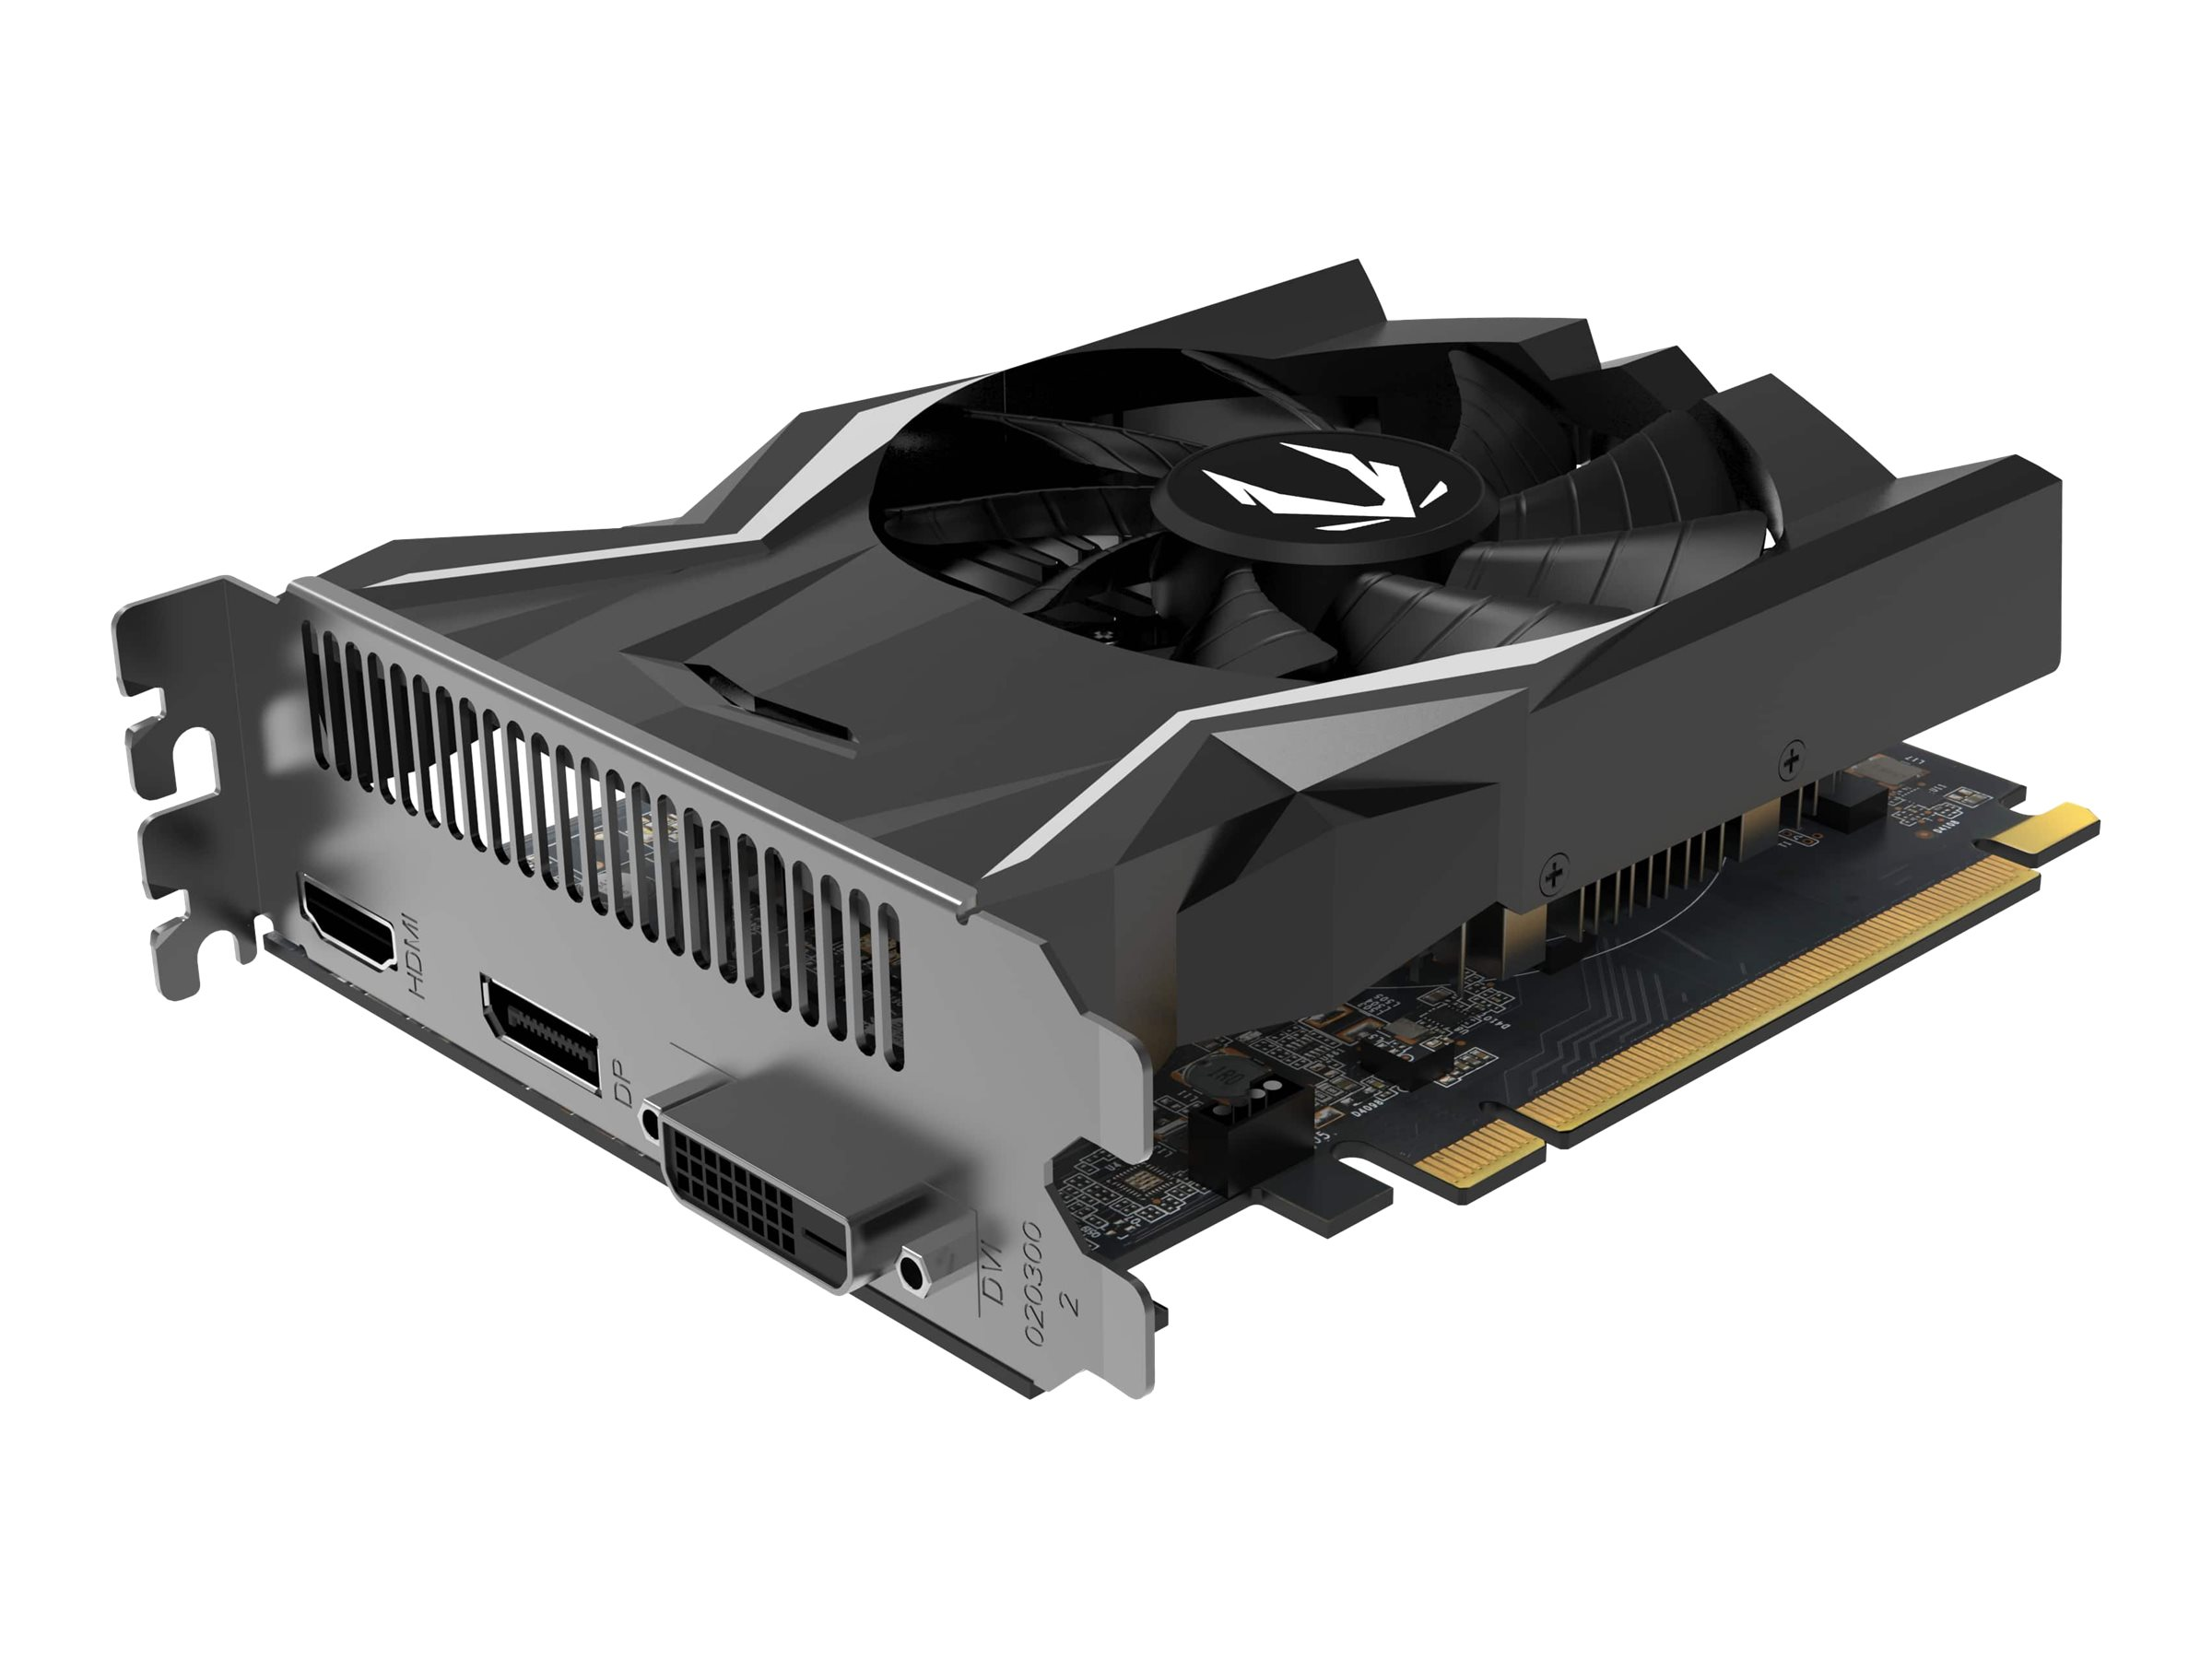 ZOTAC GAMING GeForce GTX 1650 OC - Grafikkarten